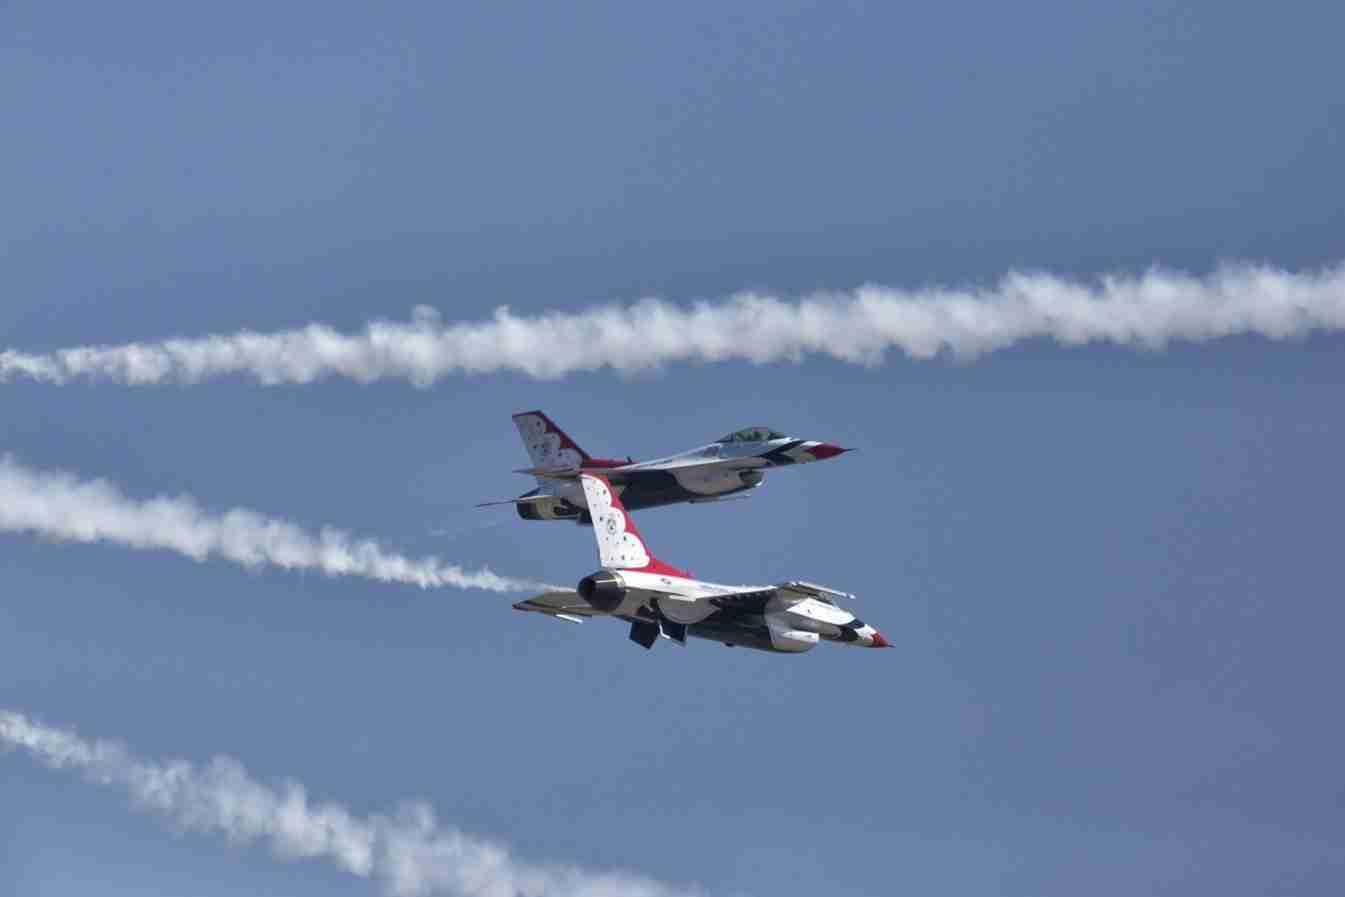 Air Force Thunderbird F-16s Cross Over Maneuver